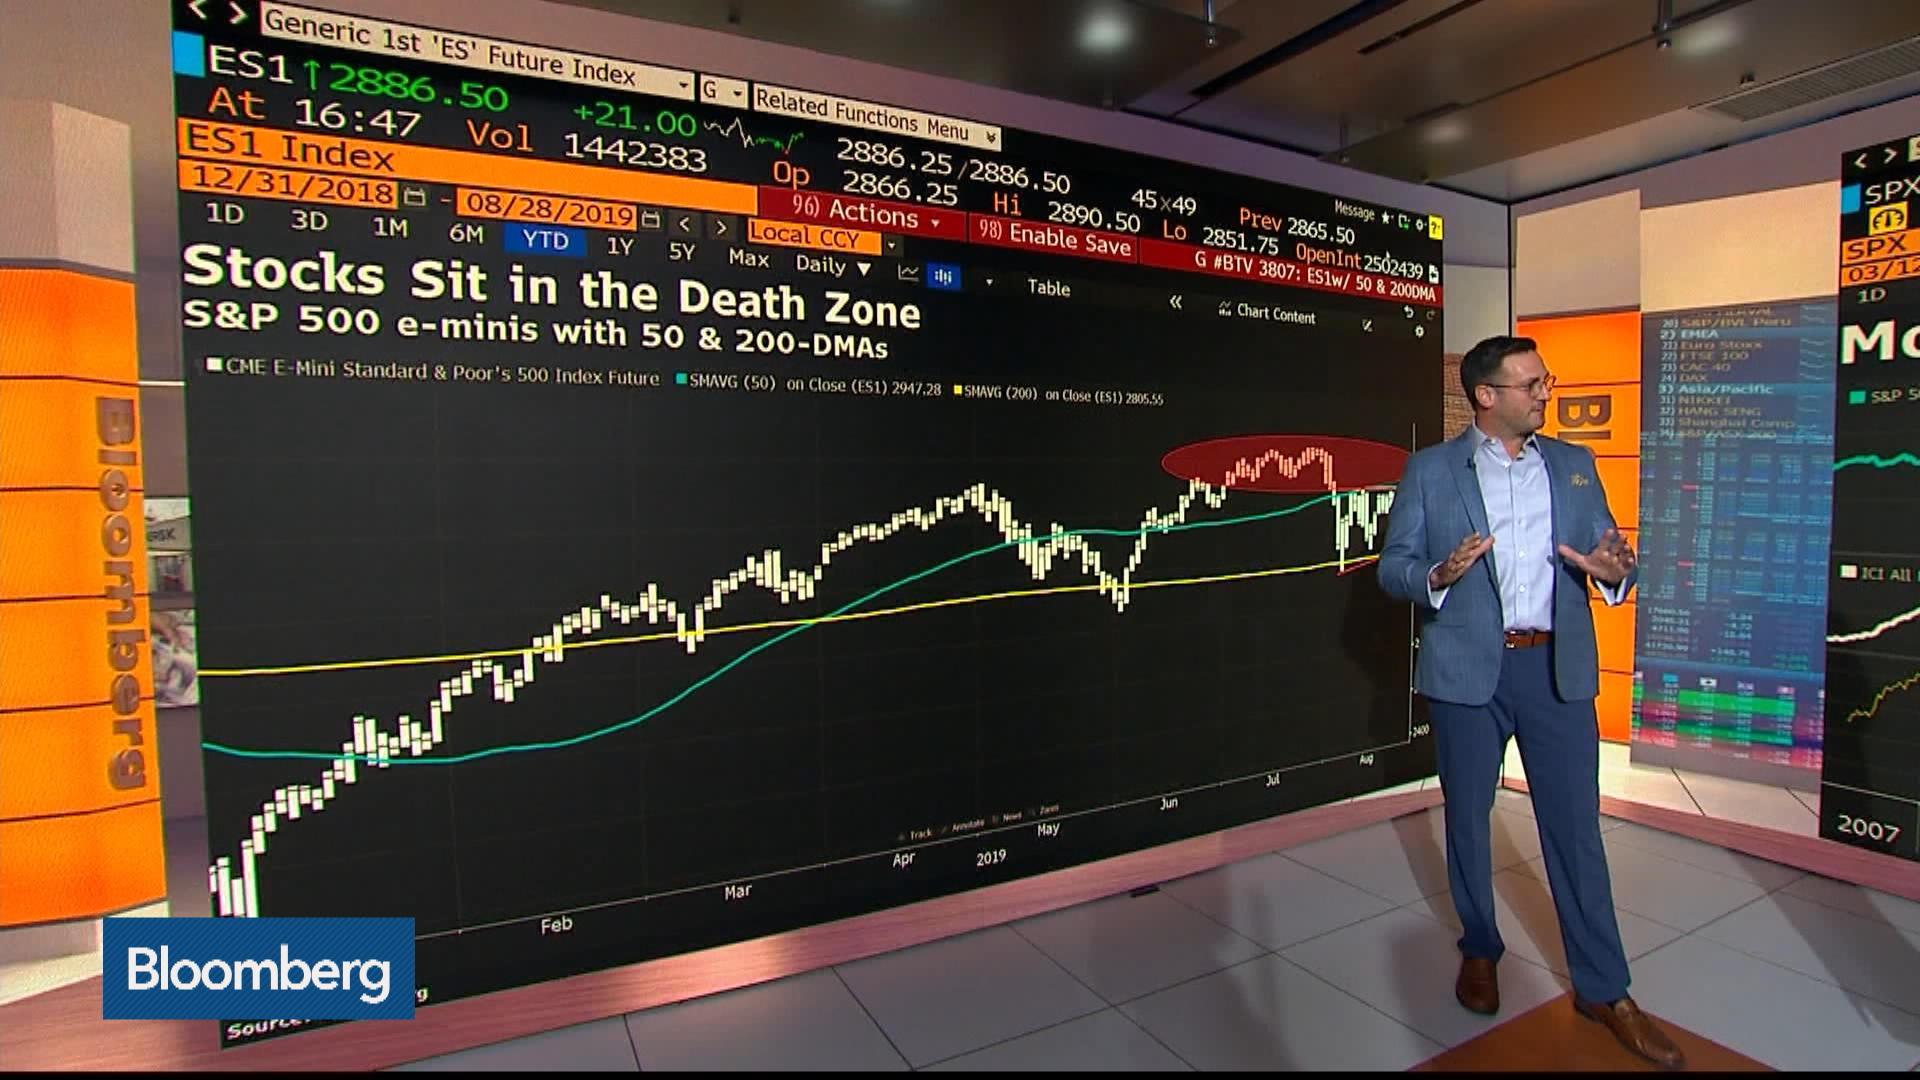 Stocks Are in a 'Death Zone': MKM's JC O'Hara